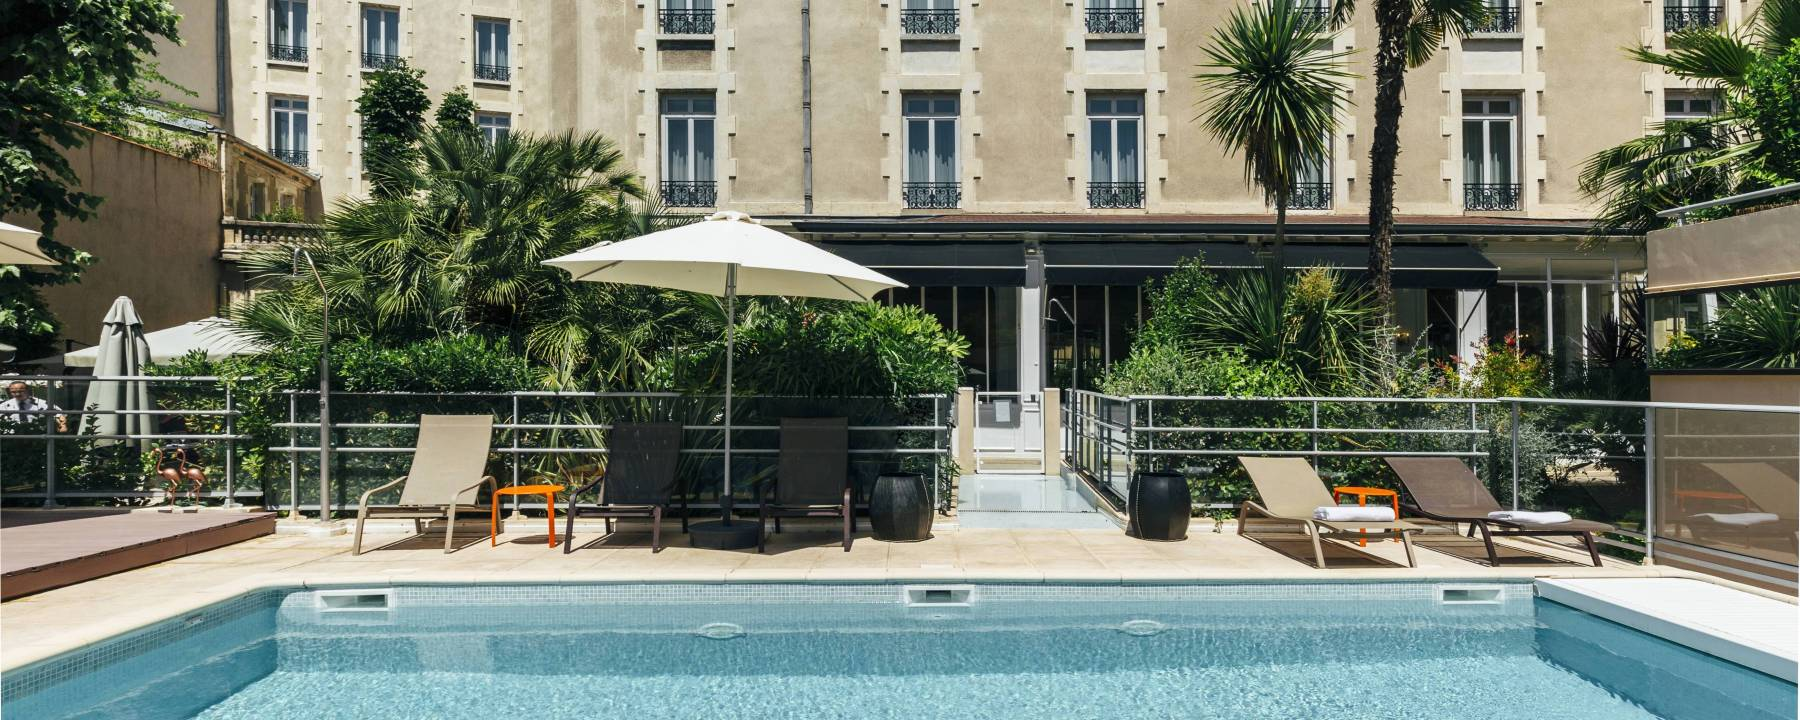 hotel oceania le metropole montpellier montpellier